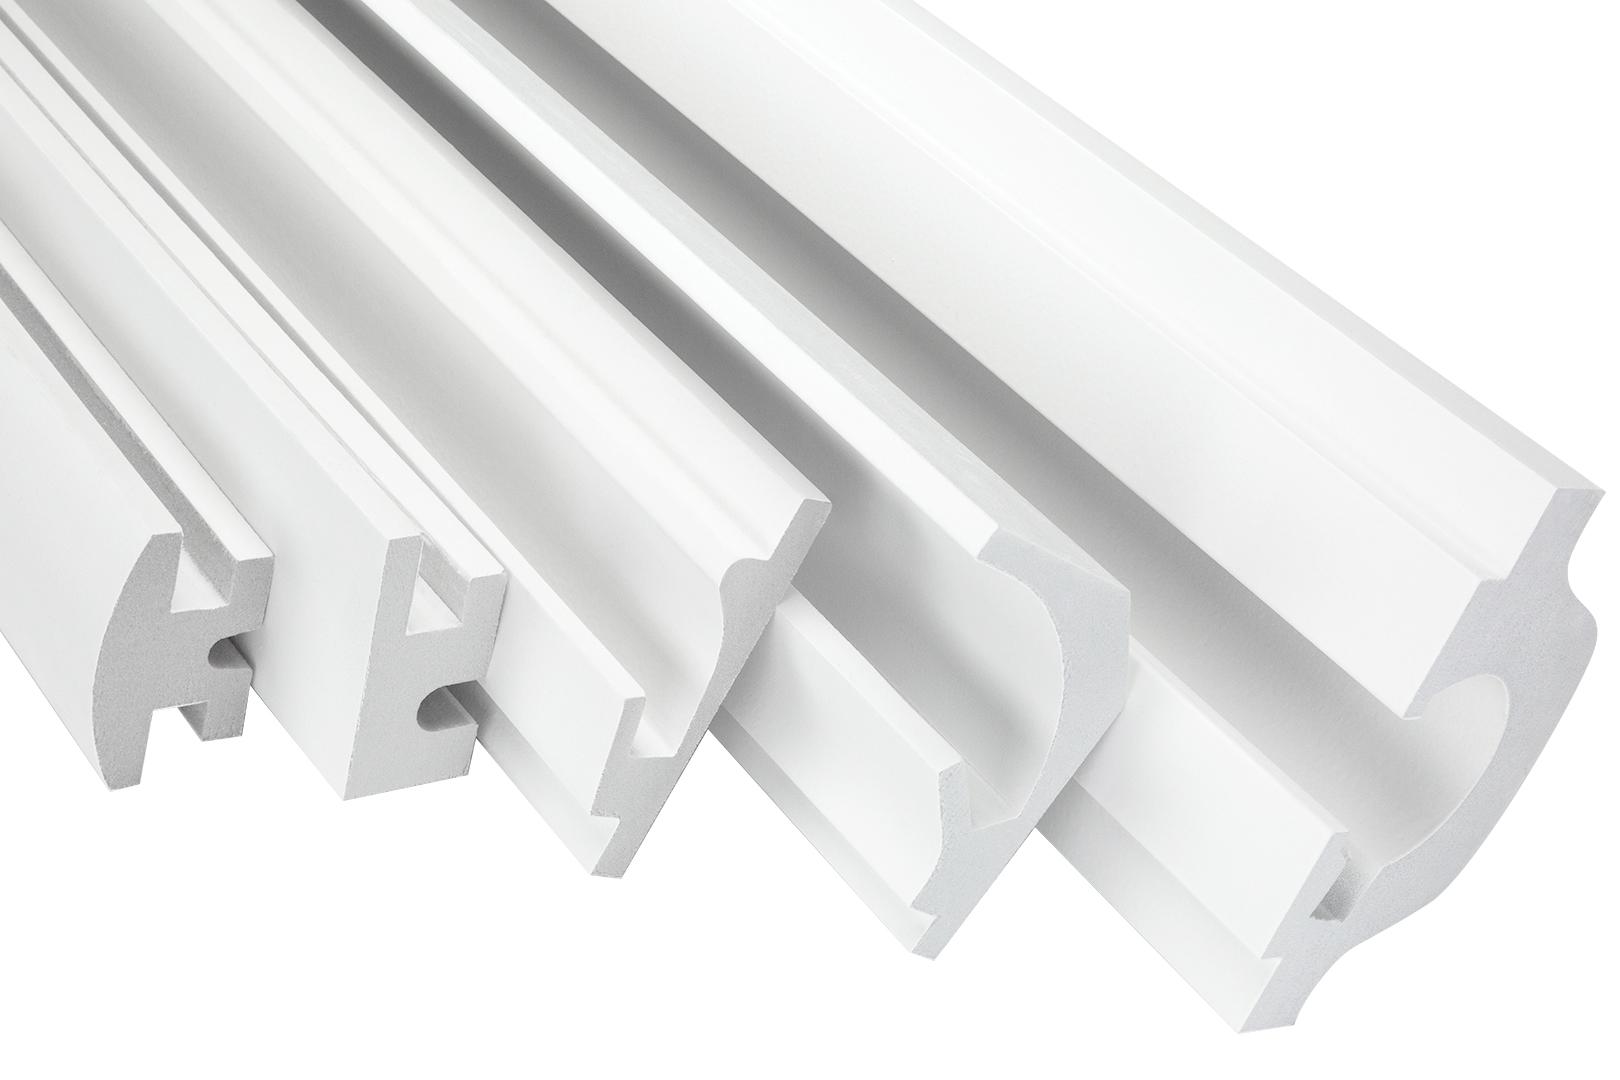 1 SET Muster Musterstücke Warenmuster Stuck Polystyrol LED Lichtleiste KD Serie